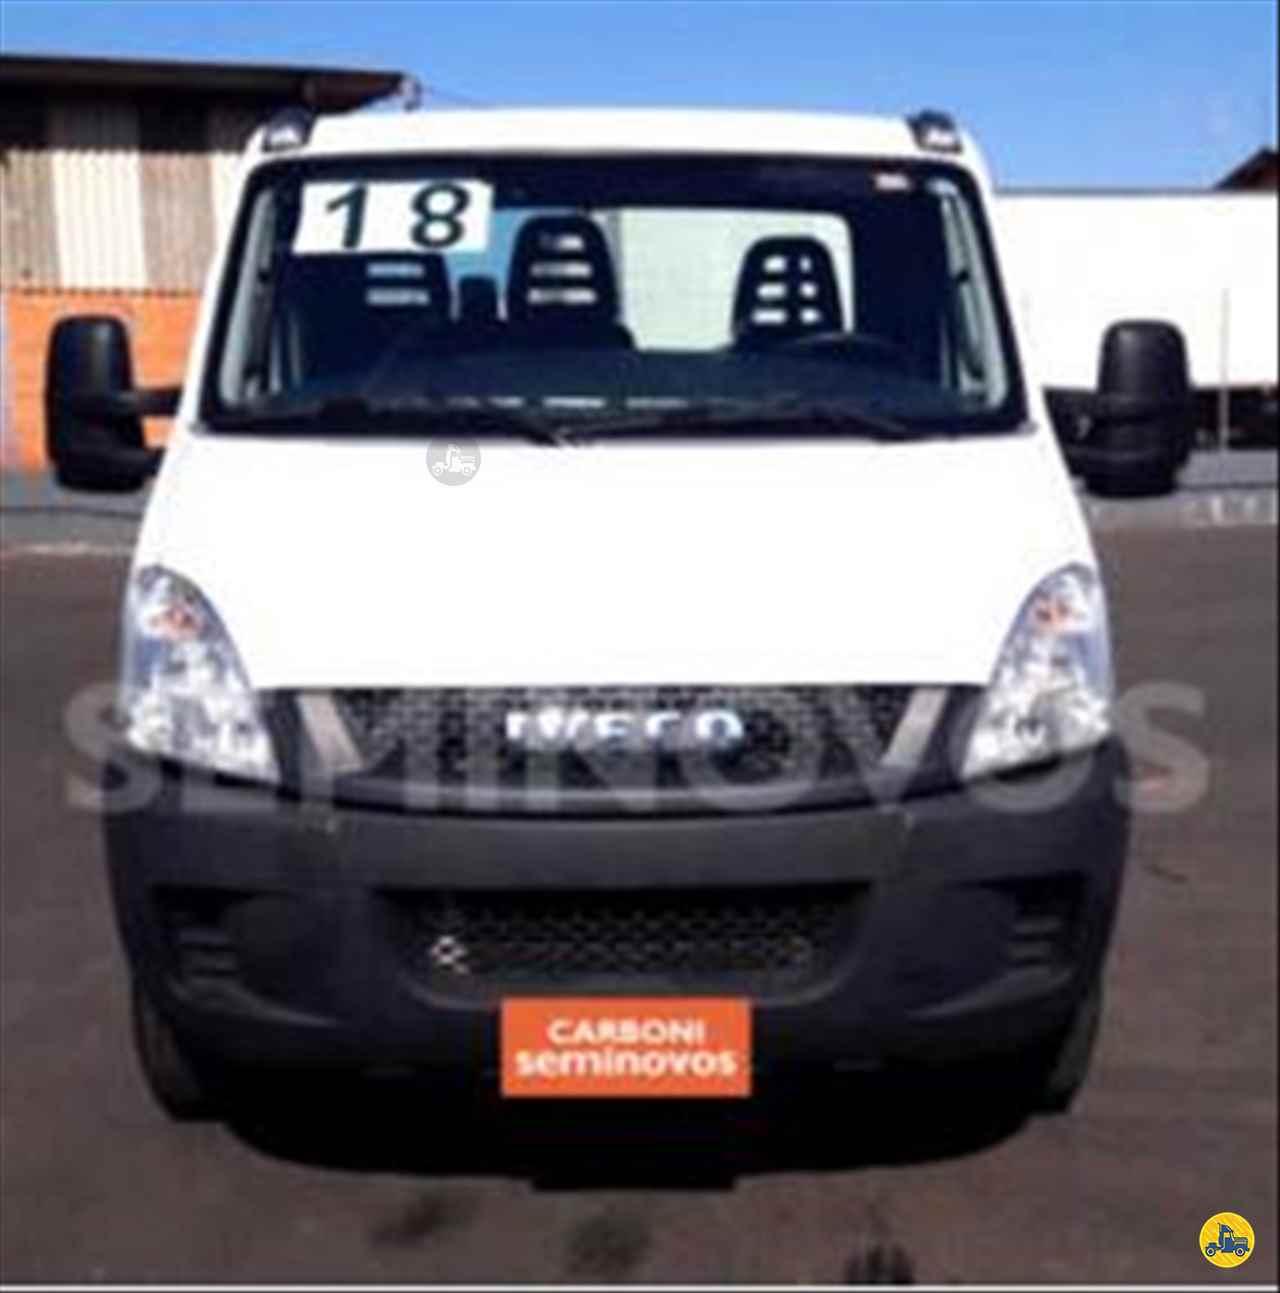 CAMINHAO IVECO DAILY 35s14 Chassis Toco 4x2 Carboni Iveco VIDEIRA SANTA CATARINA SC